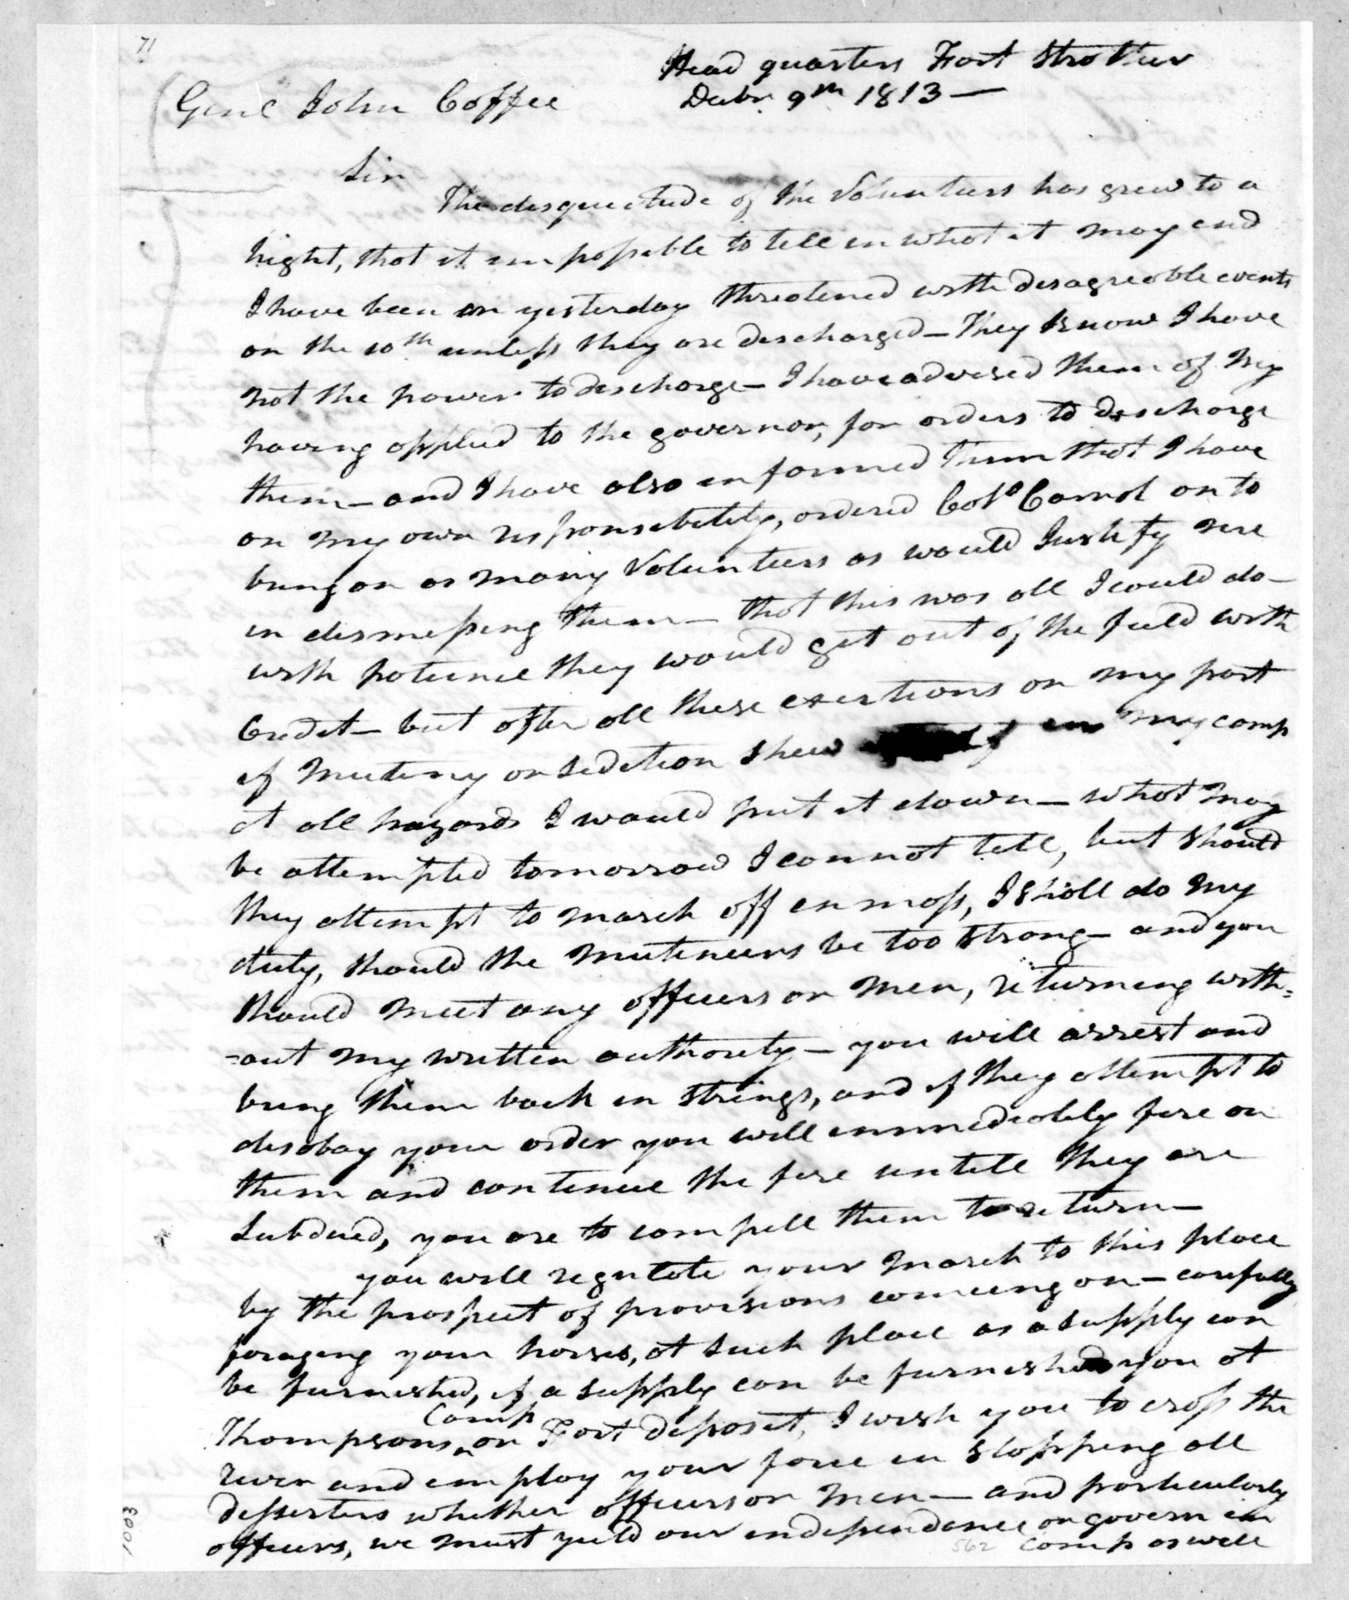 Andrew Jackson to John Coffee, December 9, 1813